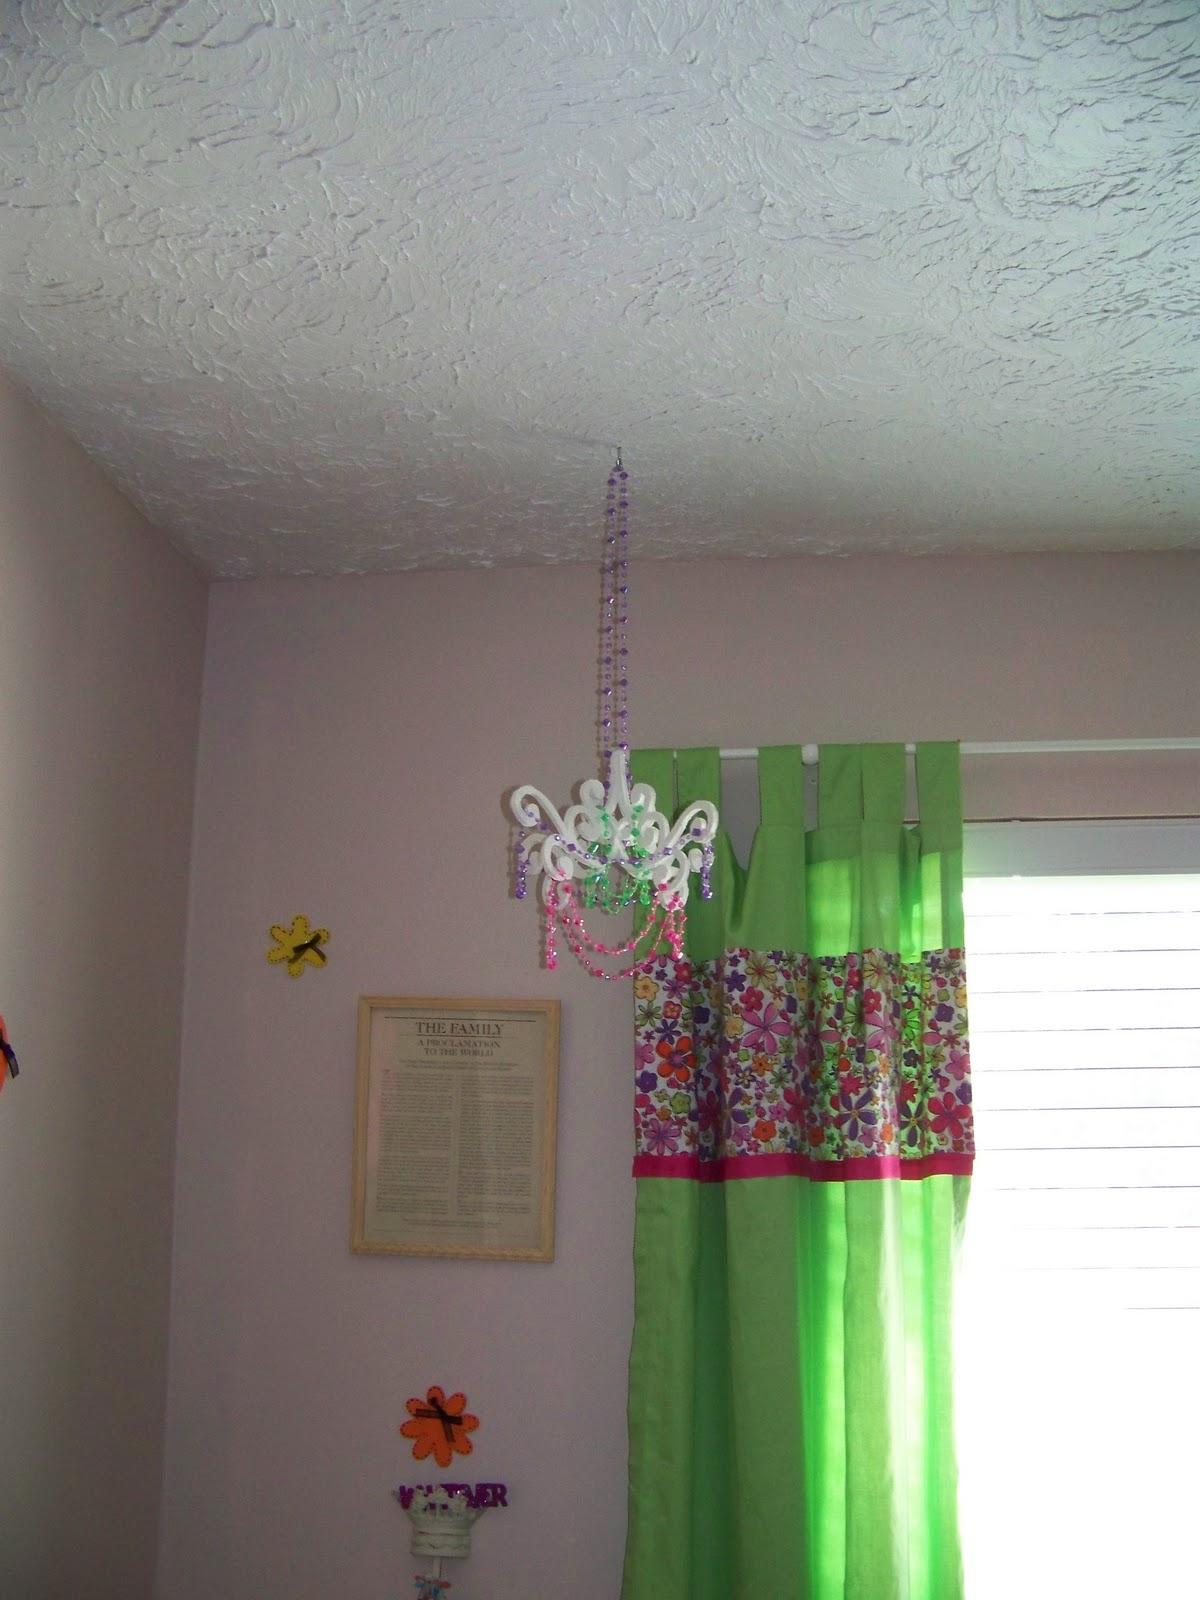 HOLM Made Chandelier Decor for a Little Girls Room